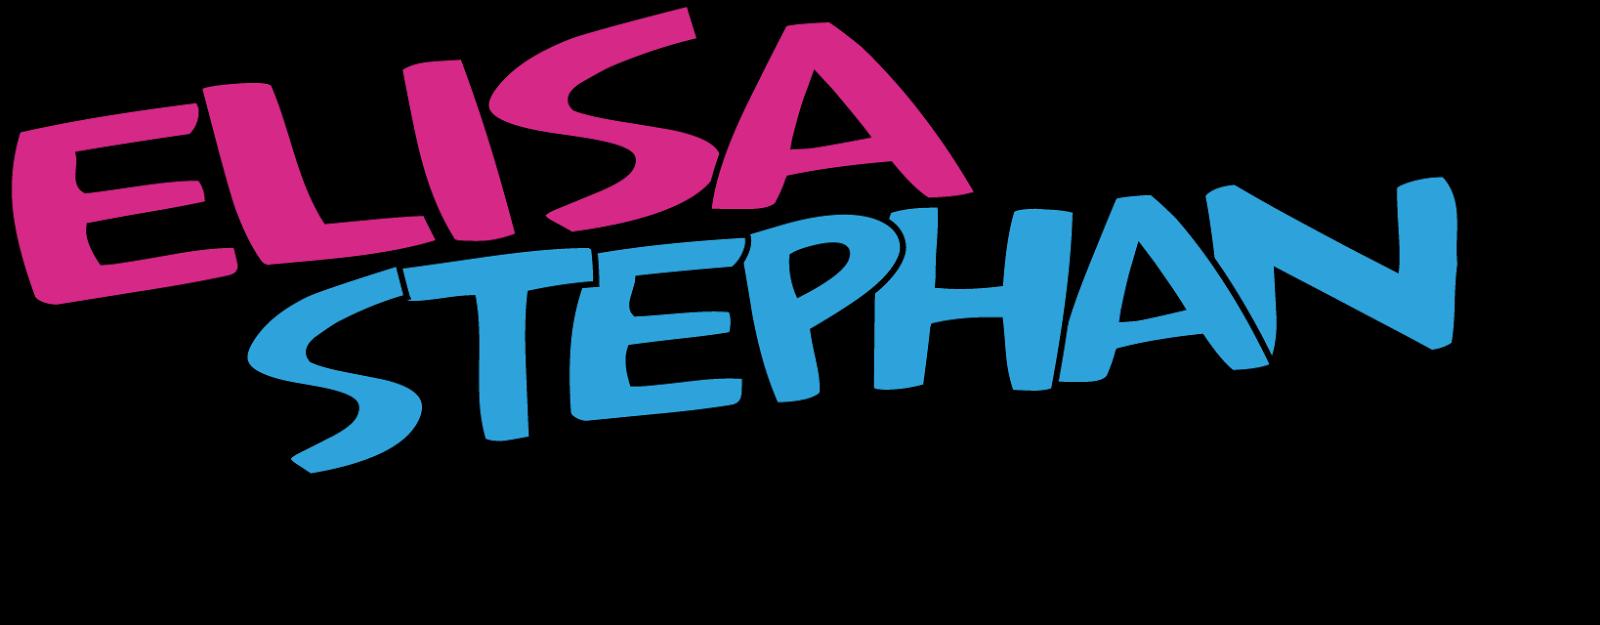 Elisa & Stephan bauen ein FingerHaus